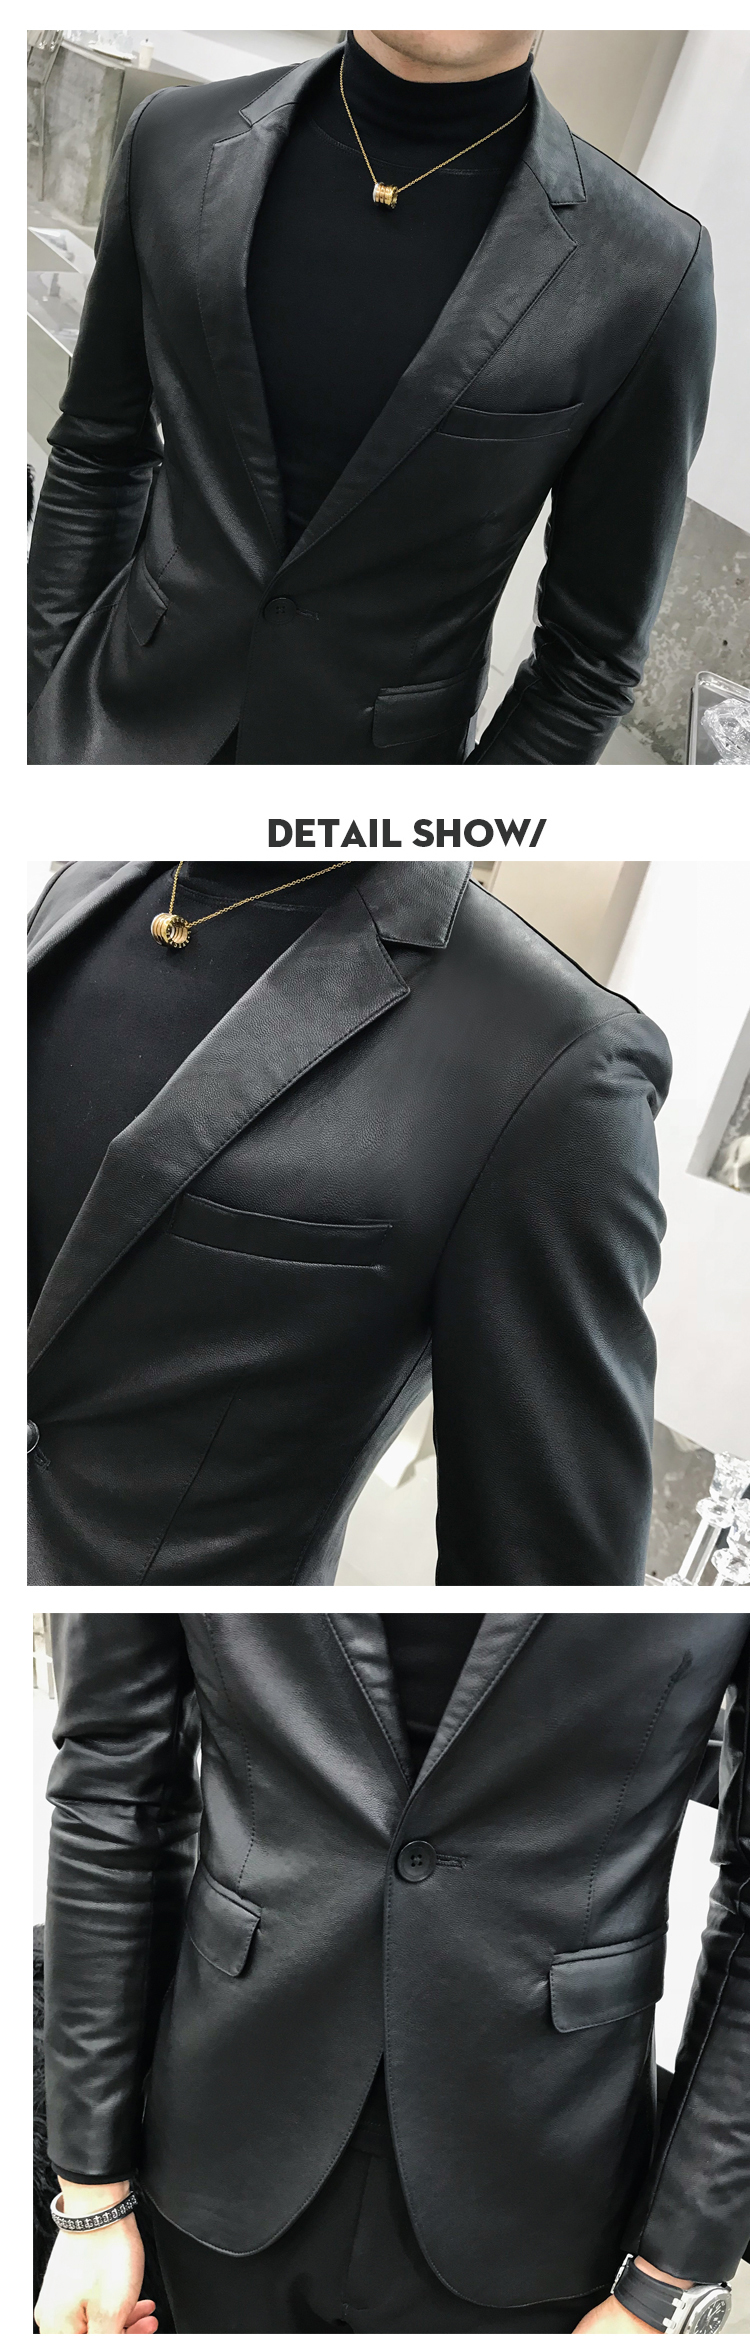 homens do blazer masculino preto masculino dos